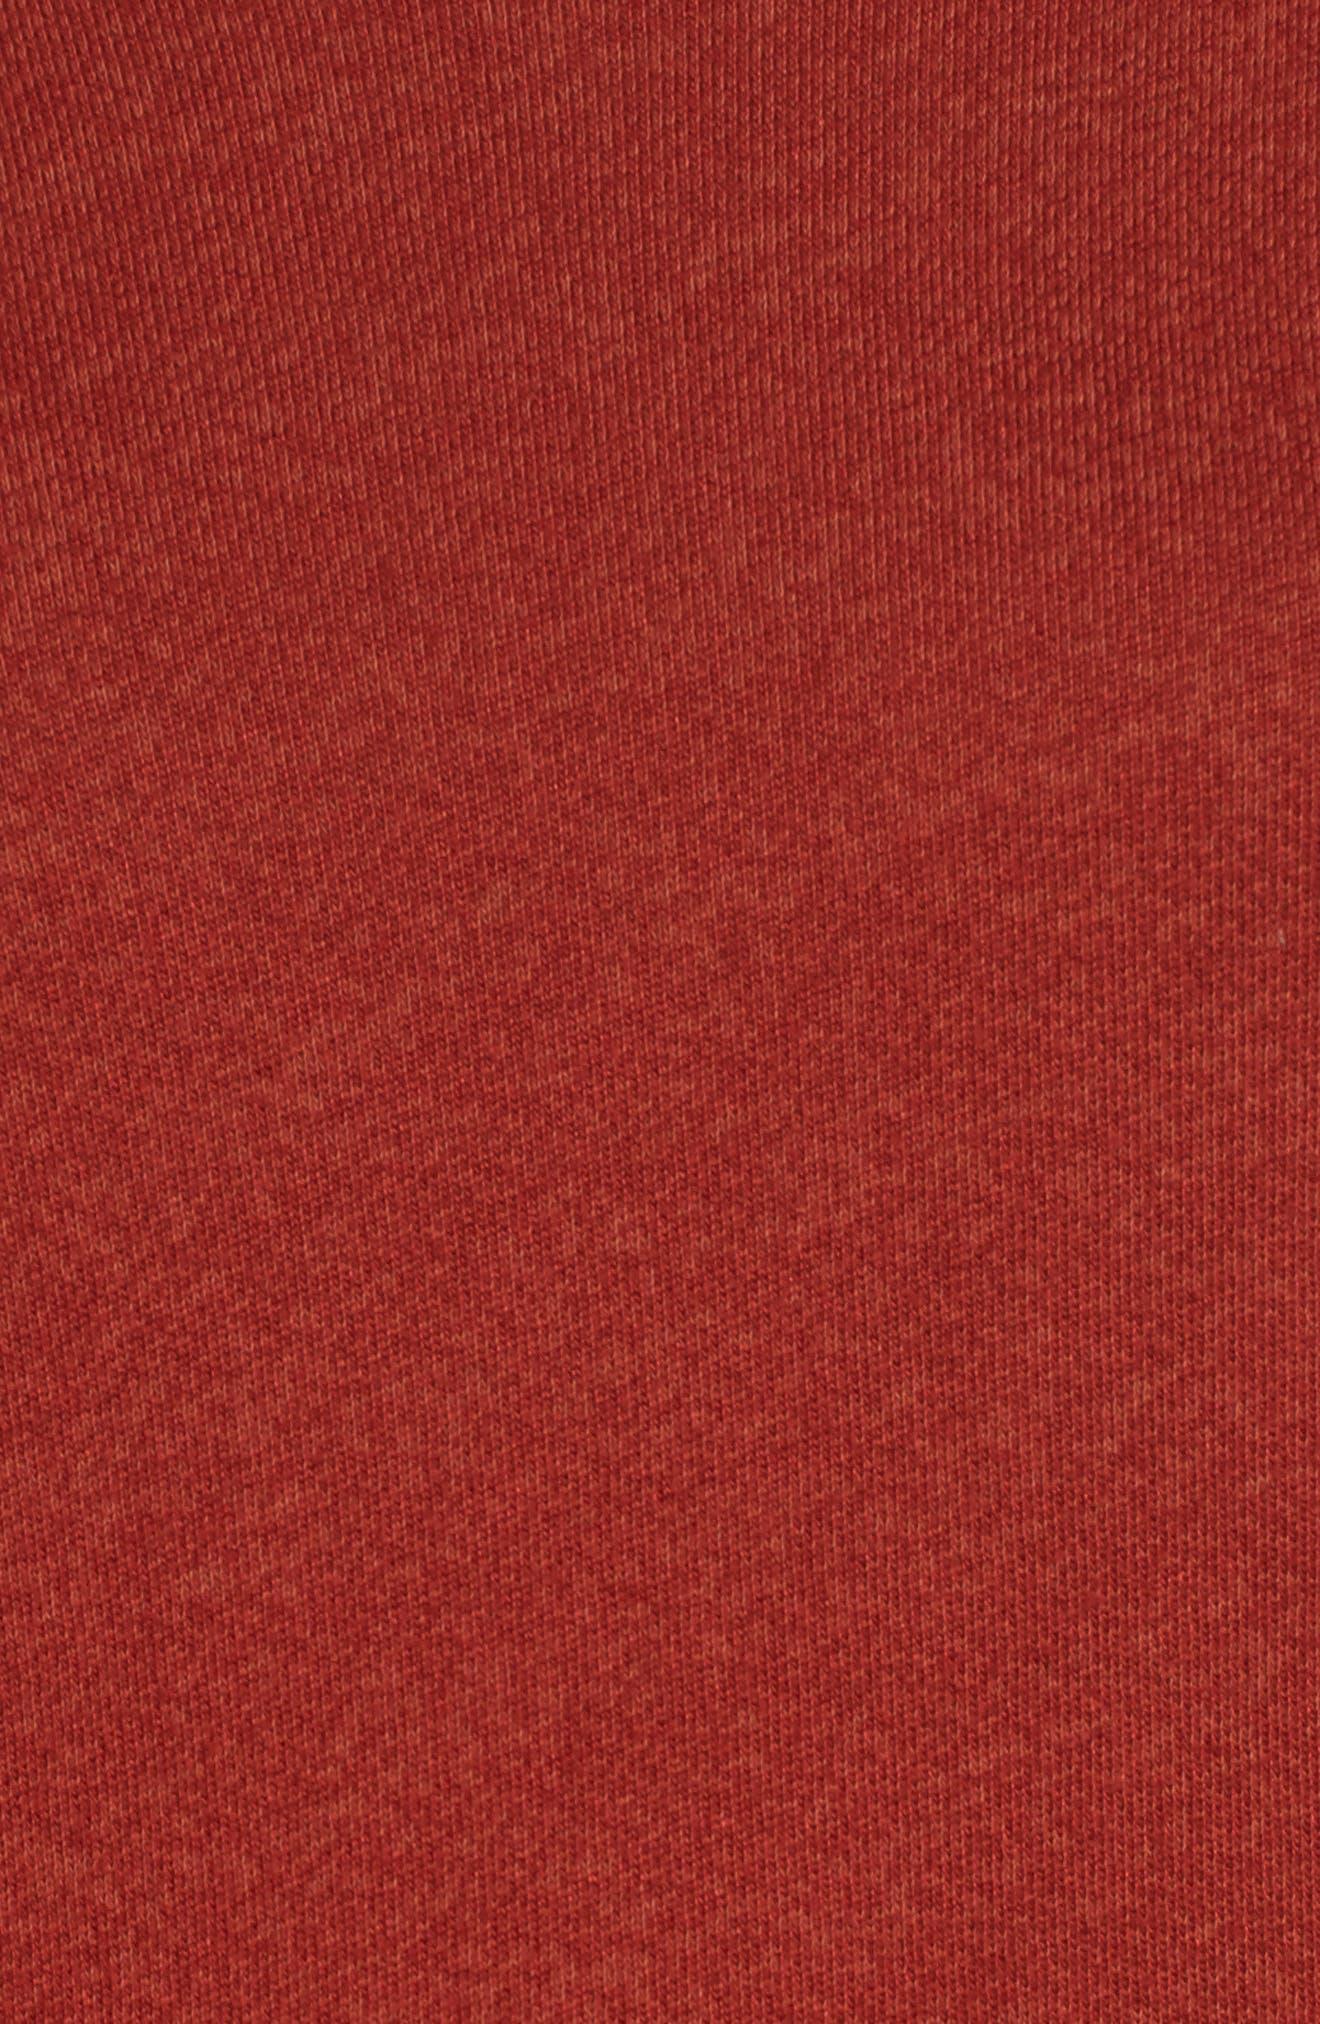 Penny Hooded Sweatshirt,                             Alternate thumbnail 5, color,                             639